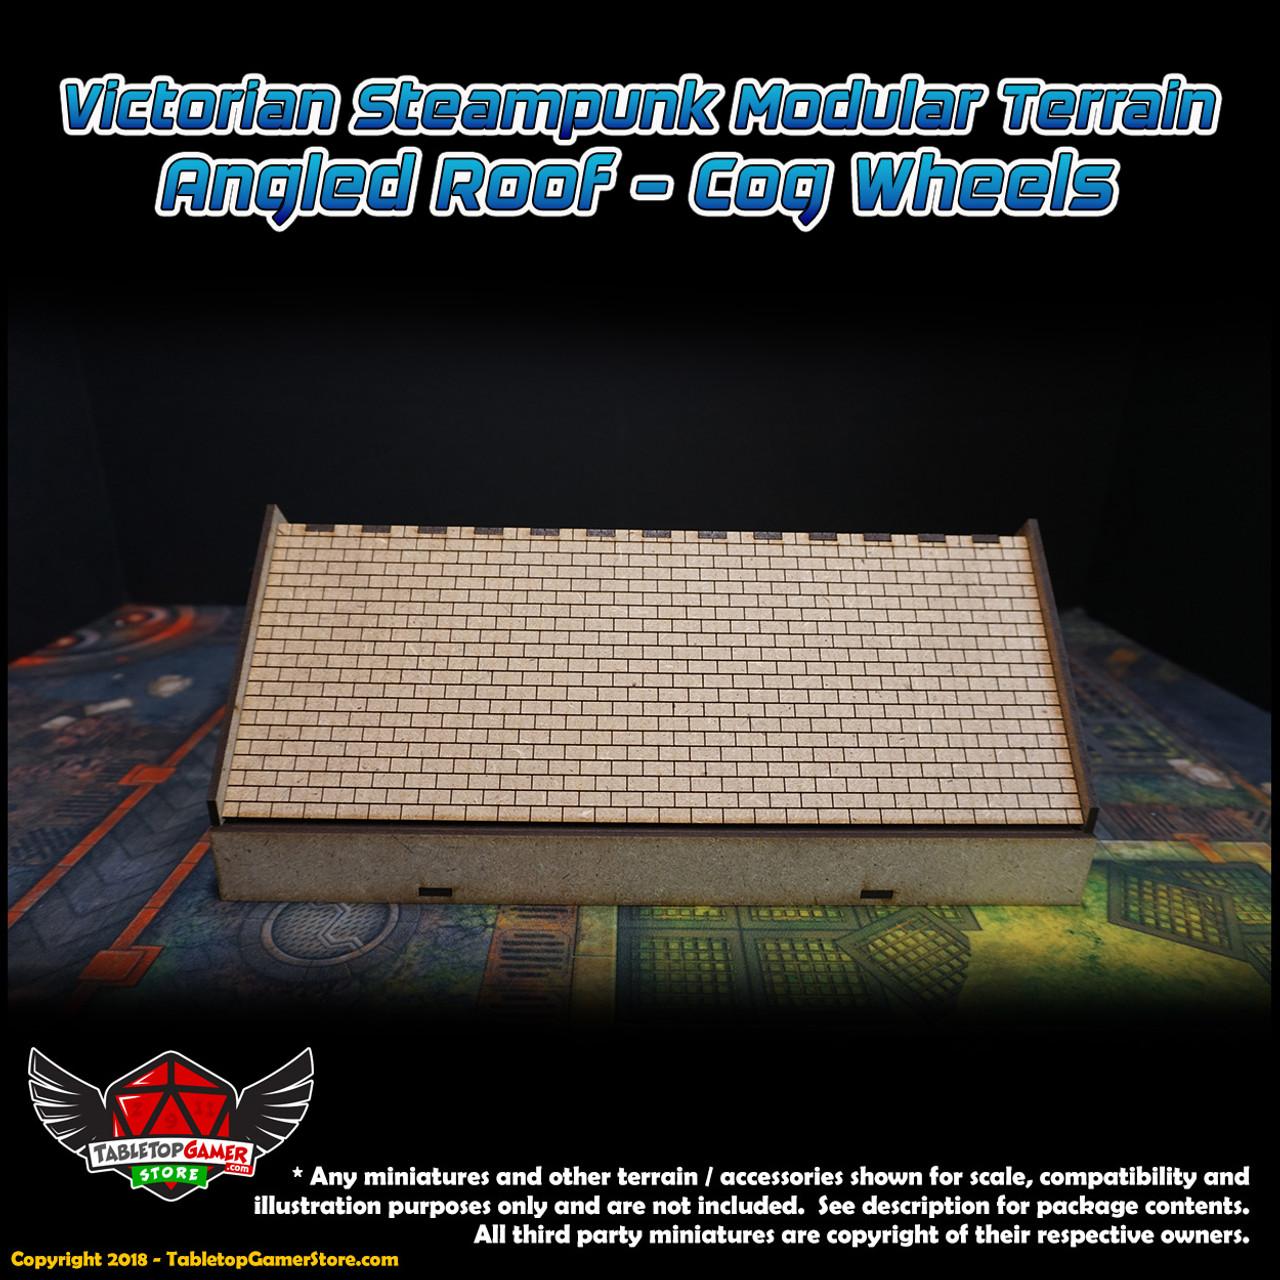 Victorian Steampunk Modular Terrain - Angled Roof - Cog Wheels